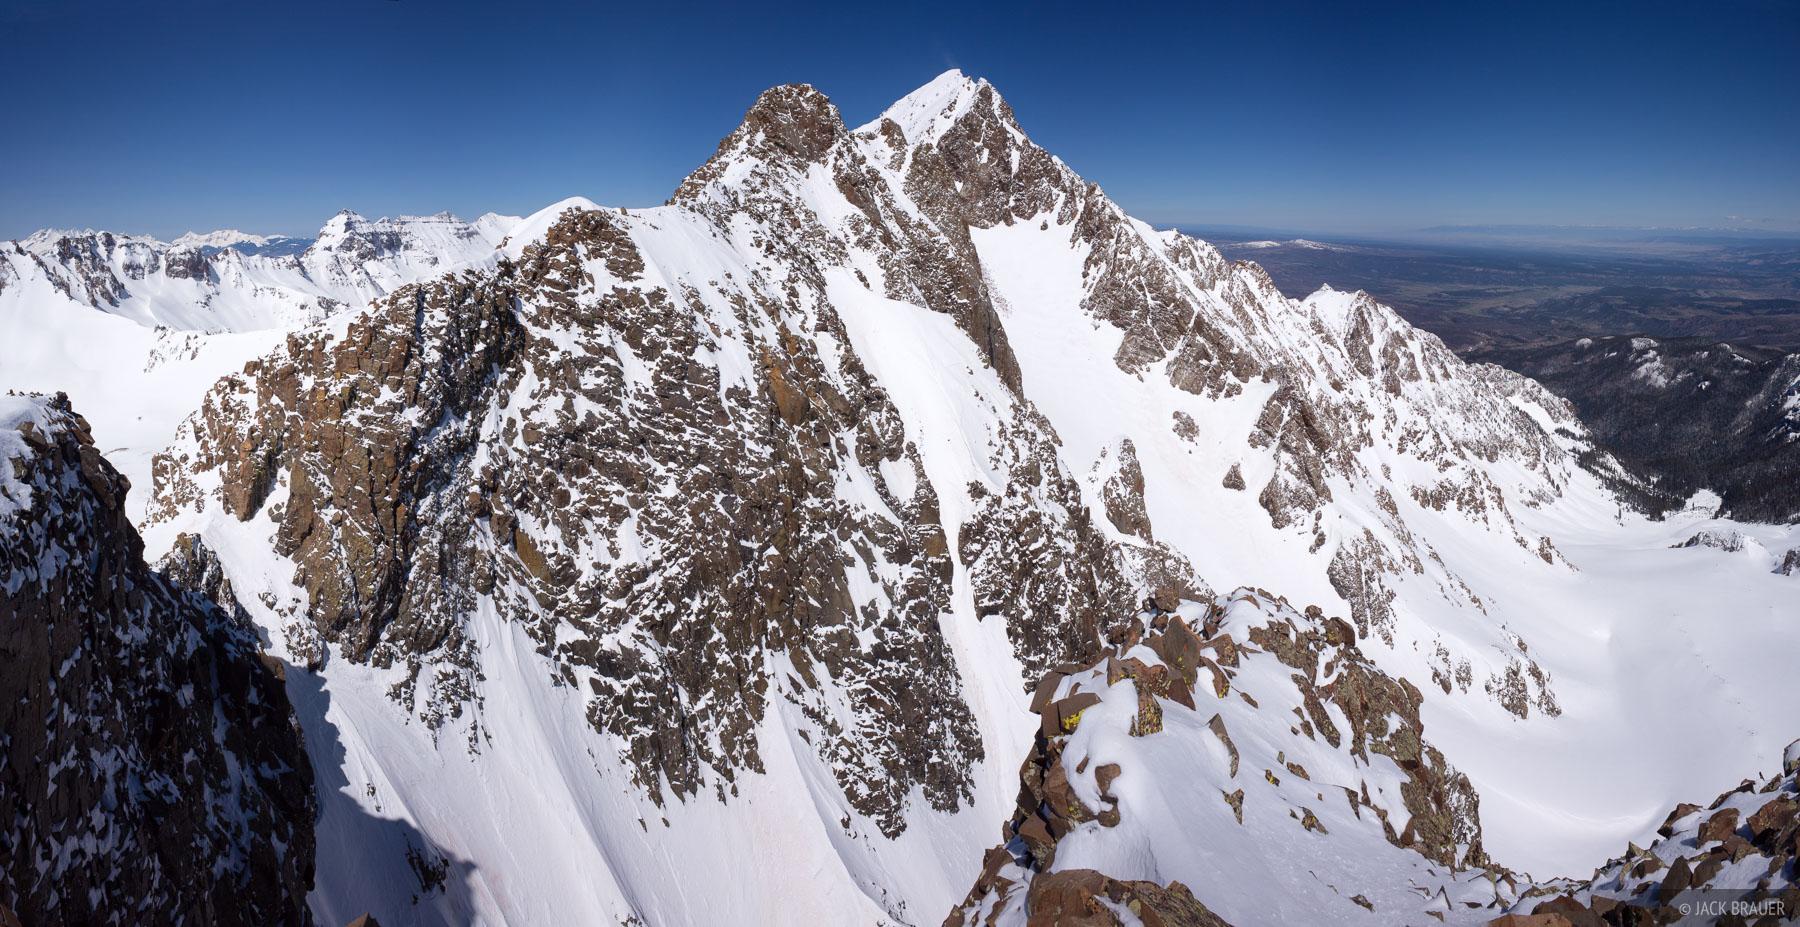 Colorado,Kismet,Mt. Sneffels,San Juan Mountains,Sneffels Range, photo